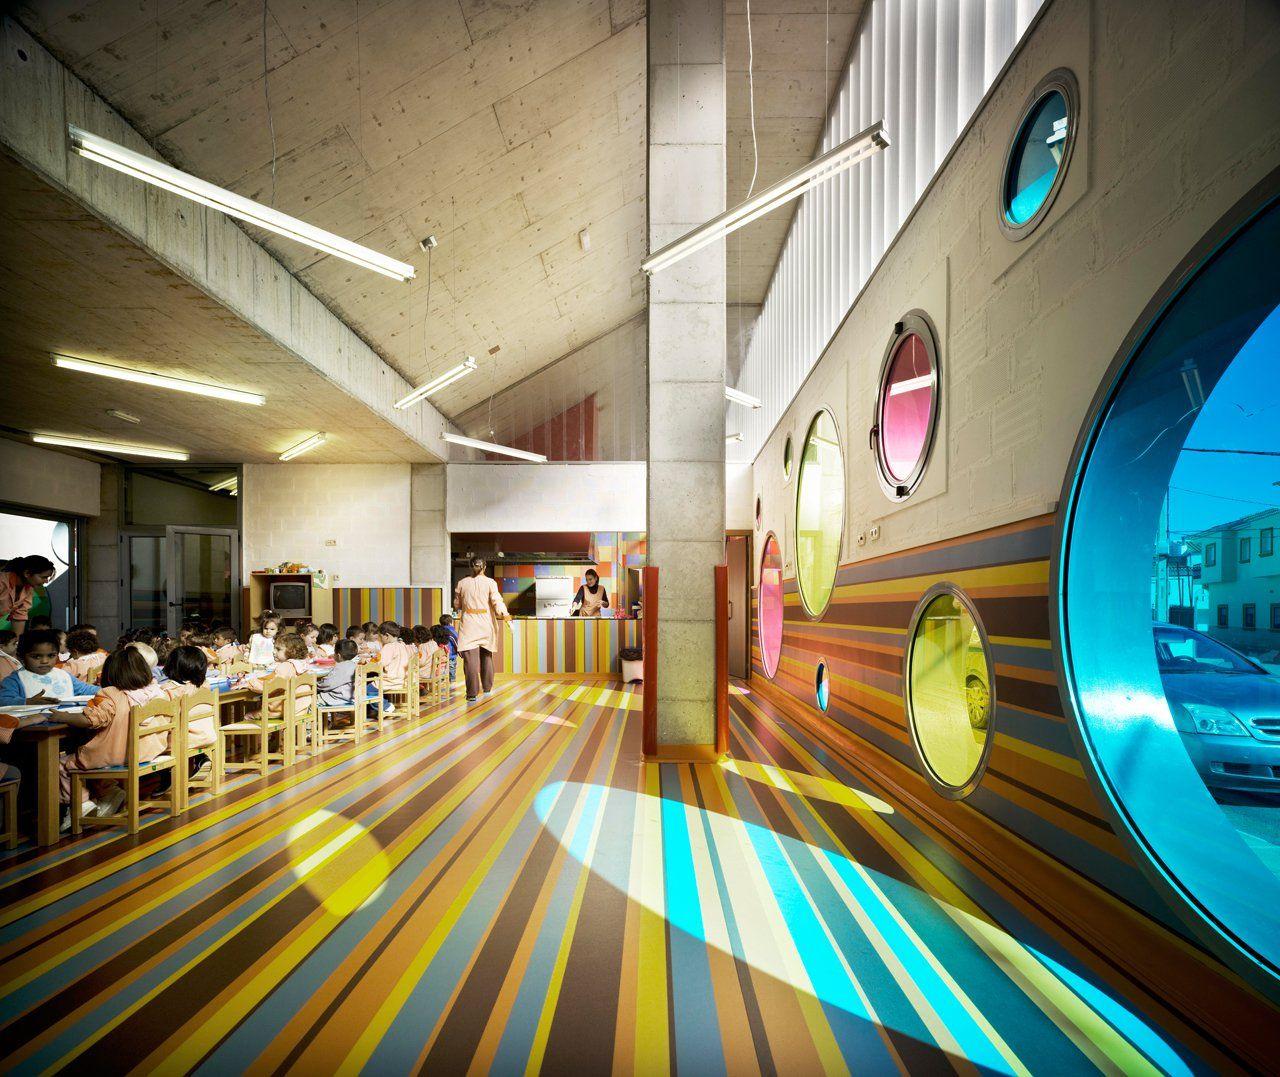 School Interior Design: 25 Most Creative Kindergartens Designs